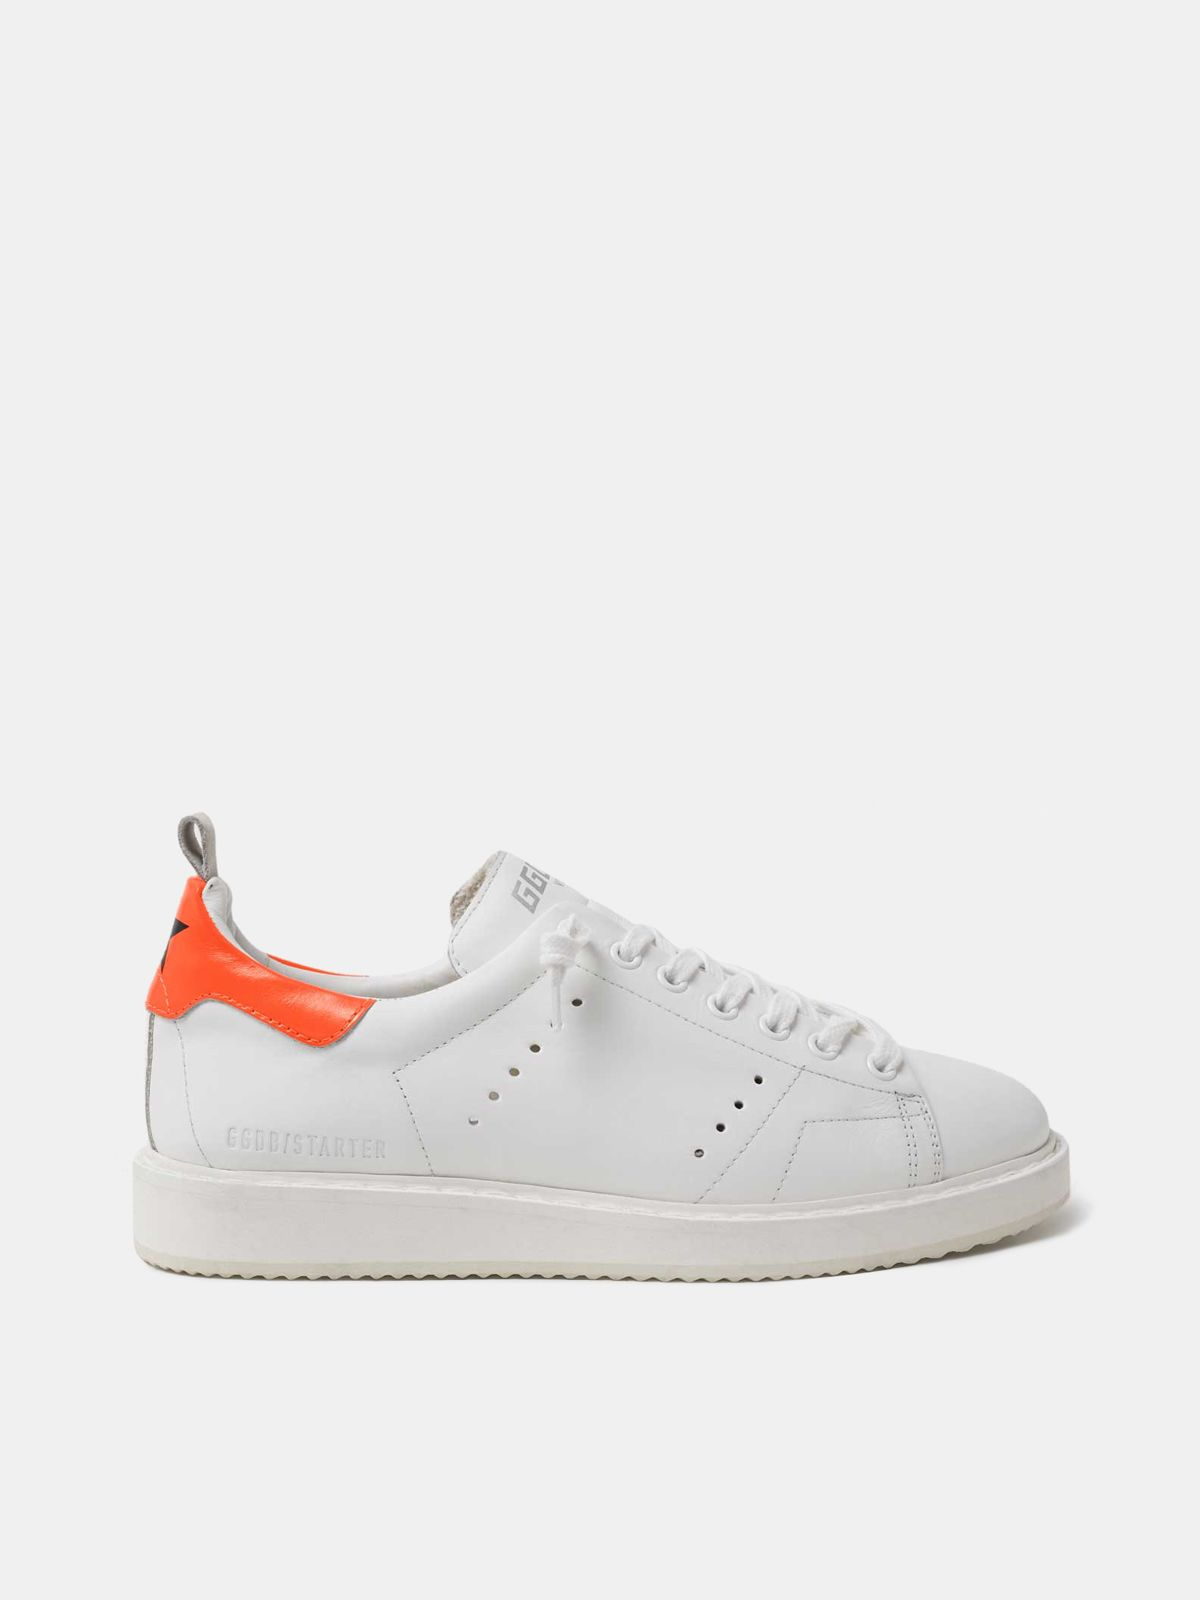 Golden Goose - White Starter sneakers with fluorescent orange heel tab in